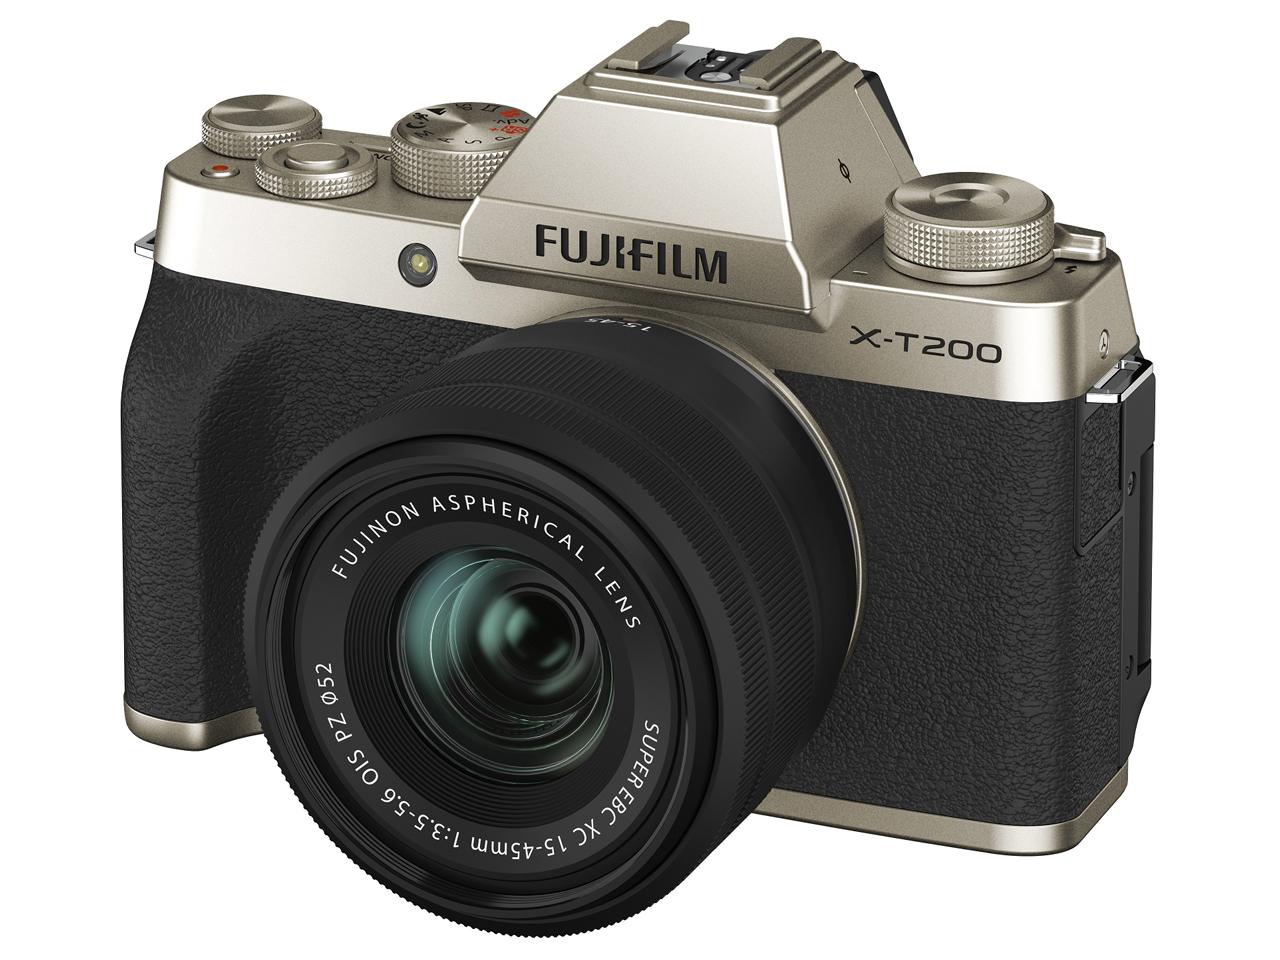 FUJIFILM X-T200 ダブルズームレンズキット [シャンパンゴールド]【お取り寄せ商品(3週間~4週間程度での入荷、発送)】